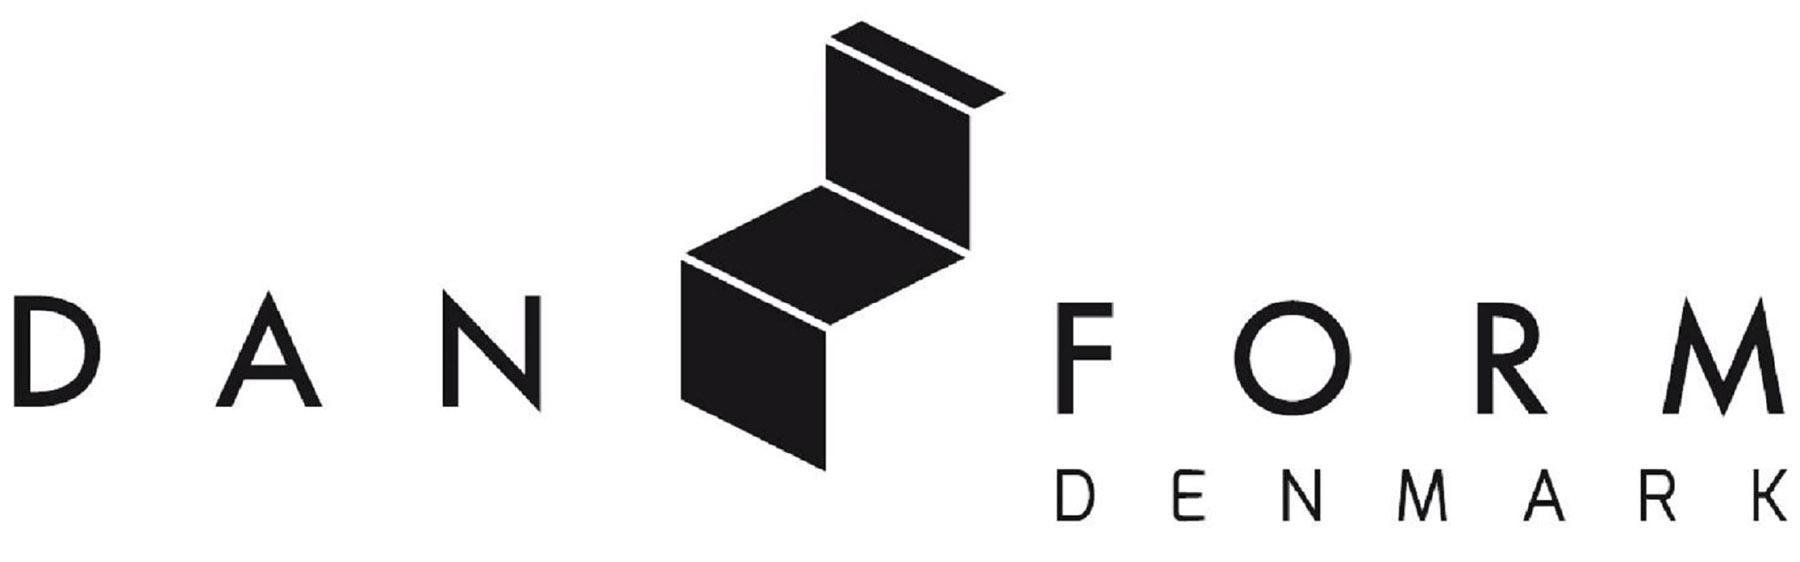 logo-Dan-Form